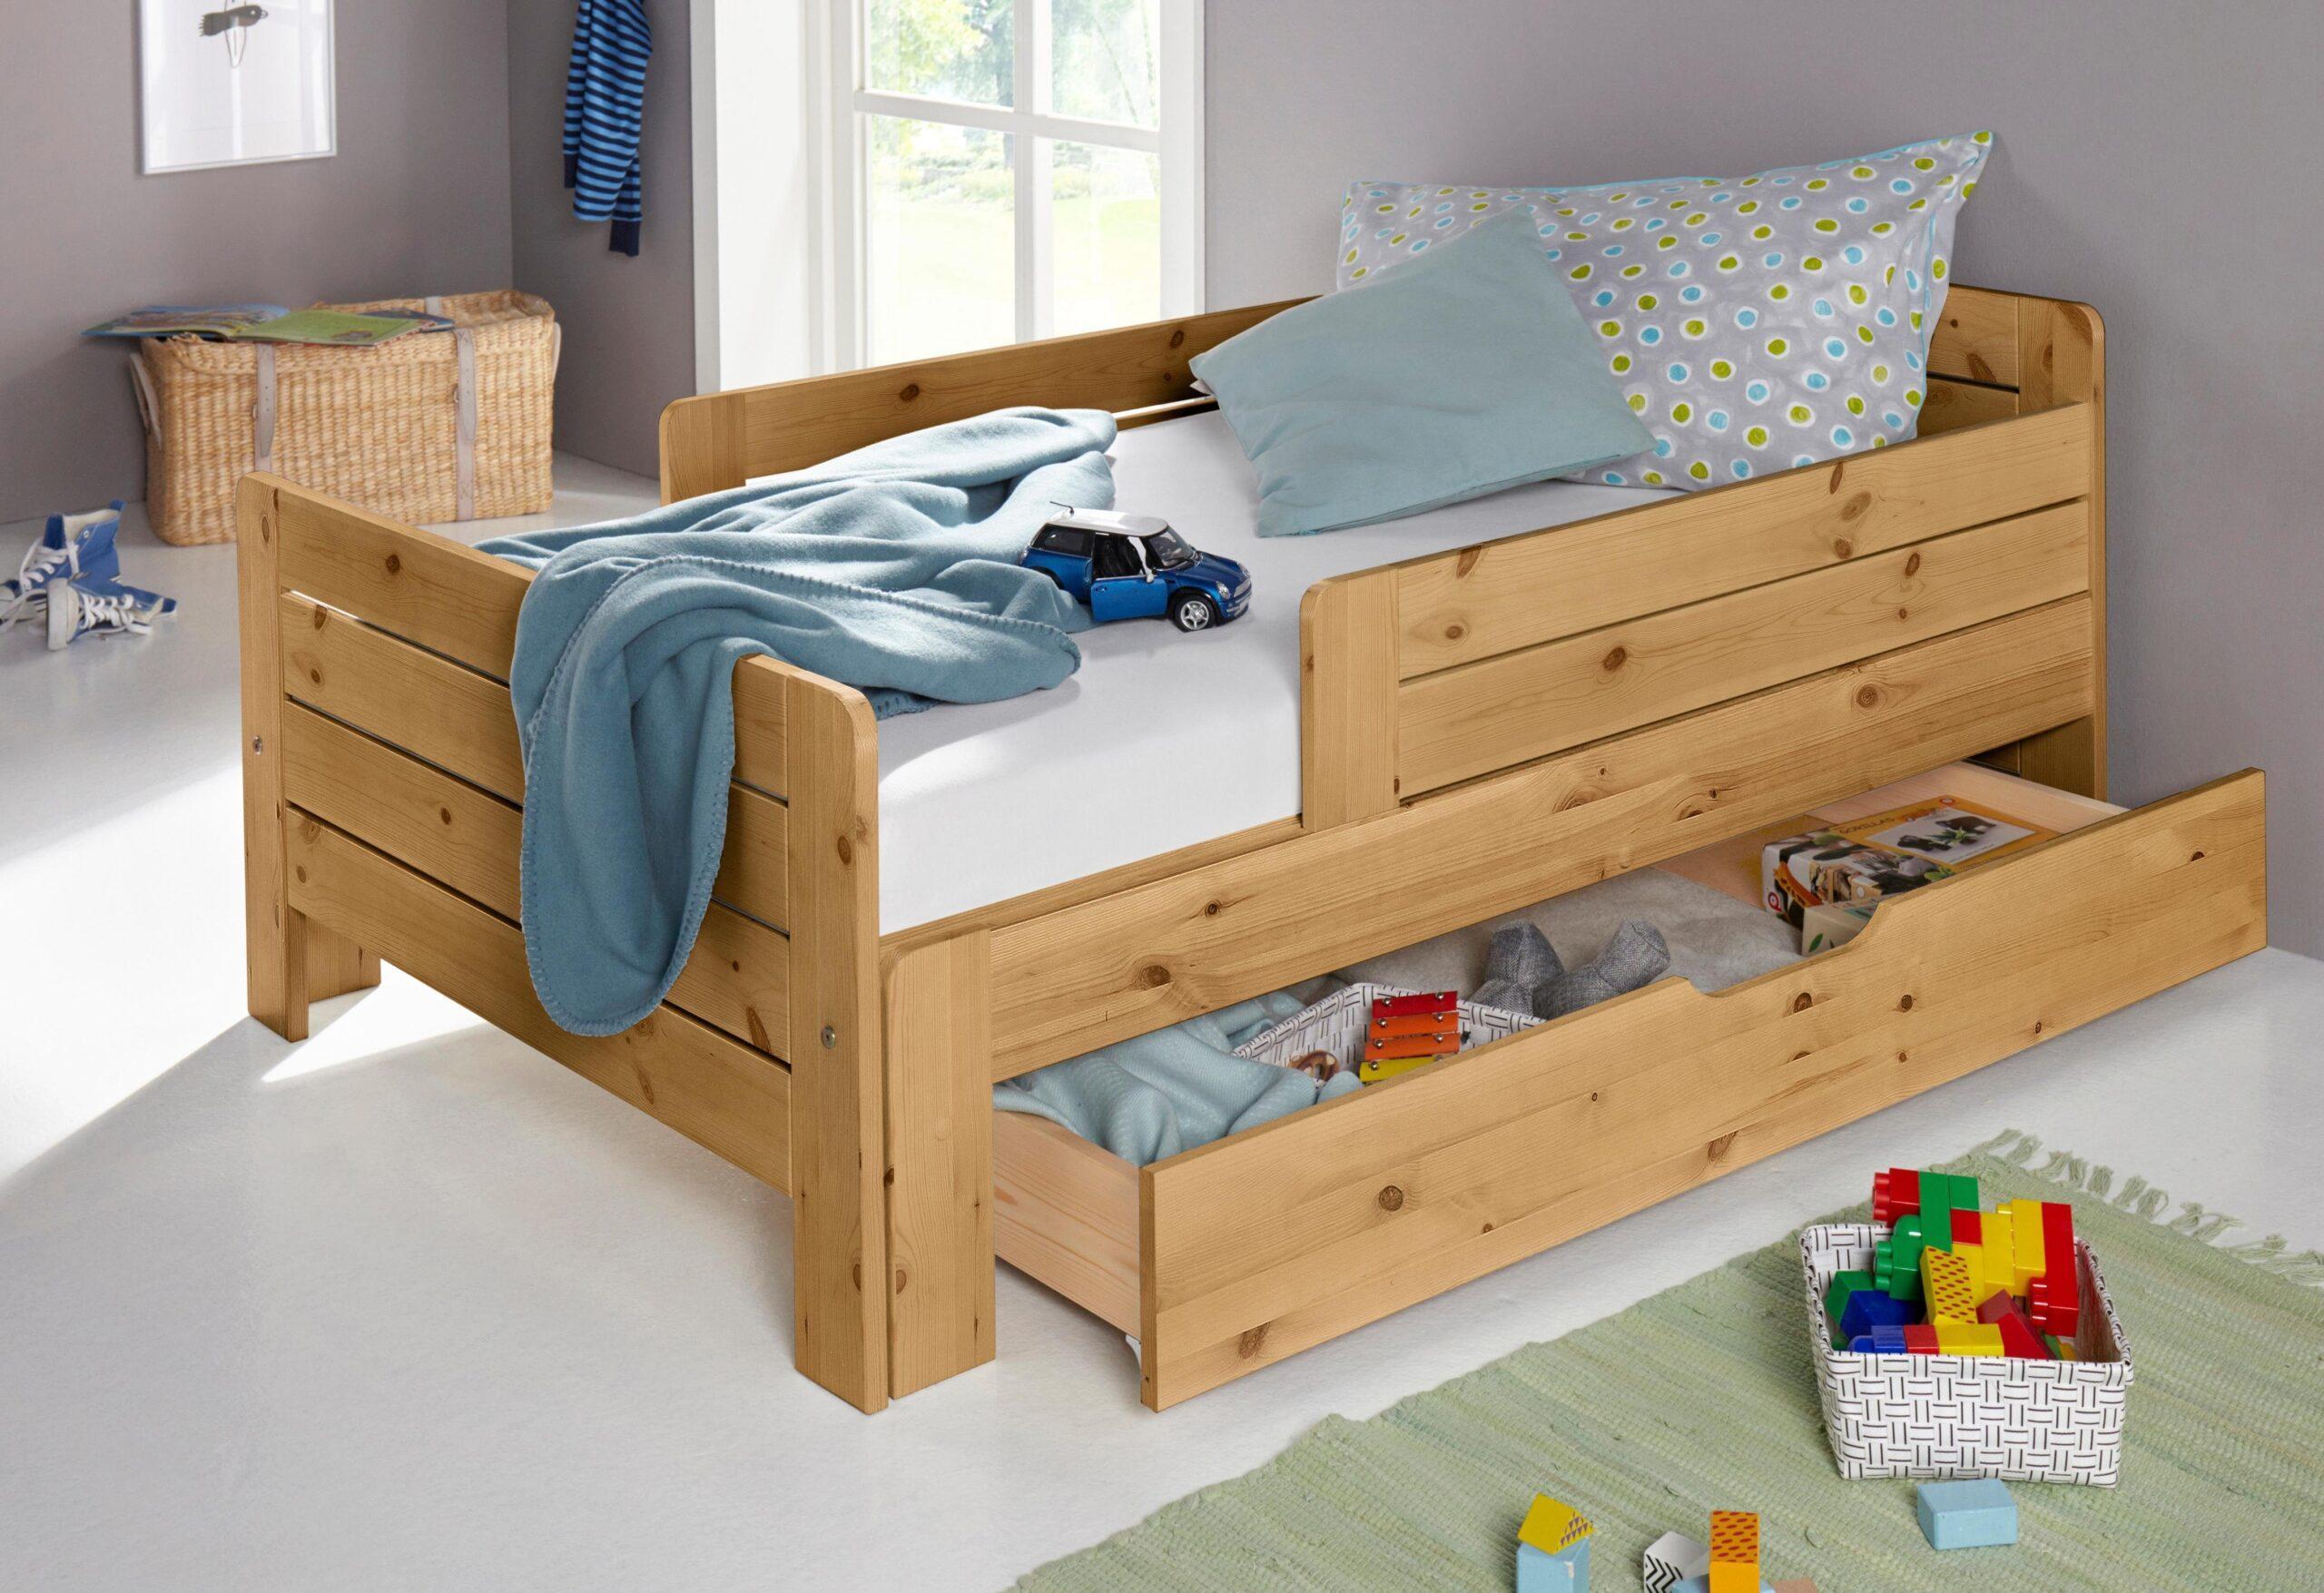 Full Size of Bett Ausziehbar Gleiche Ebene Ikea 180x200 Nolte Betten Test 160x220 Metall 90x200 Mit Lattenrost Bette Duschwanne Kinder Ausziehbares 160x200 Funktions Wohnzimmer Bett Ausziehbar Gleiche Ebene